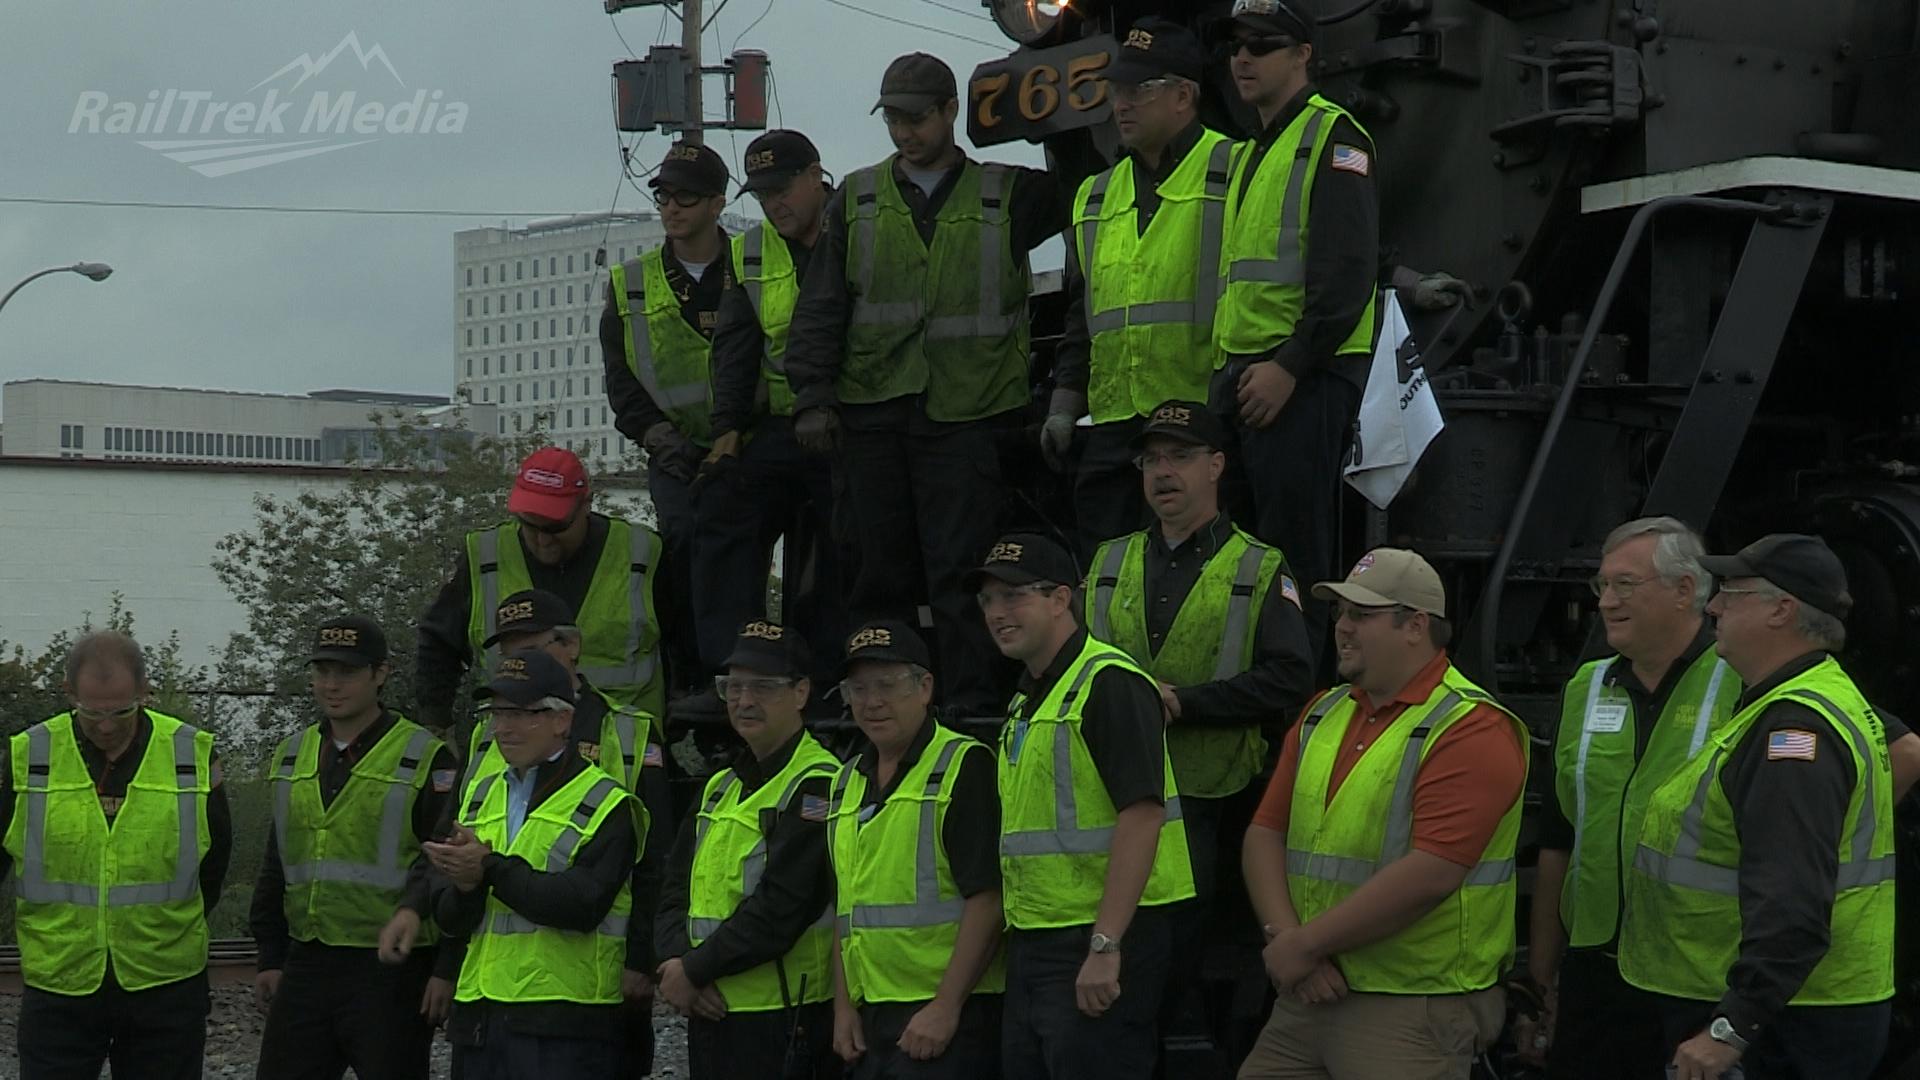 8.20.12 NKP765 Crew in Altoona with Wick.jpg